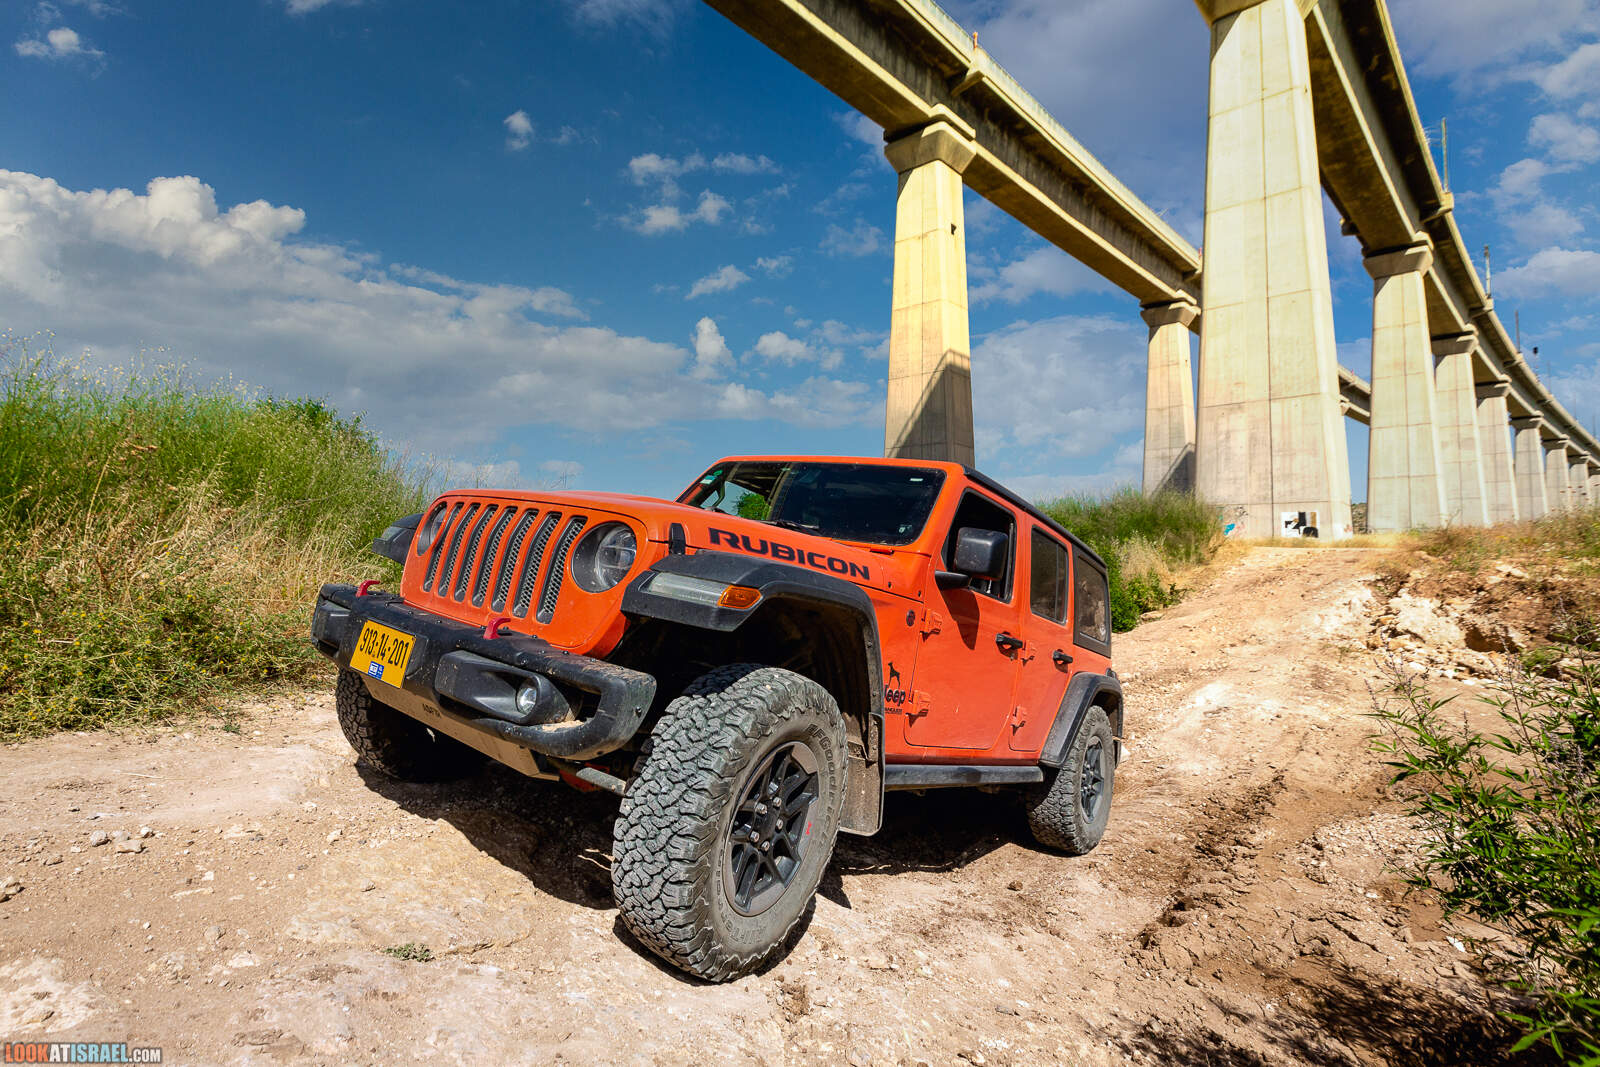 Оранжевый Jeep Wrangler Rubicon под мостом | LookAtIsrael.com - Фото путешествия по Израилю